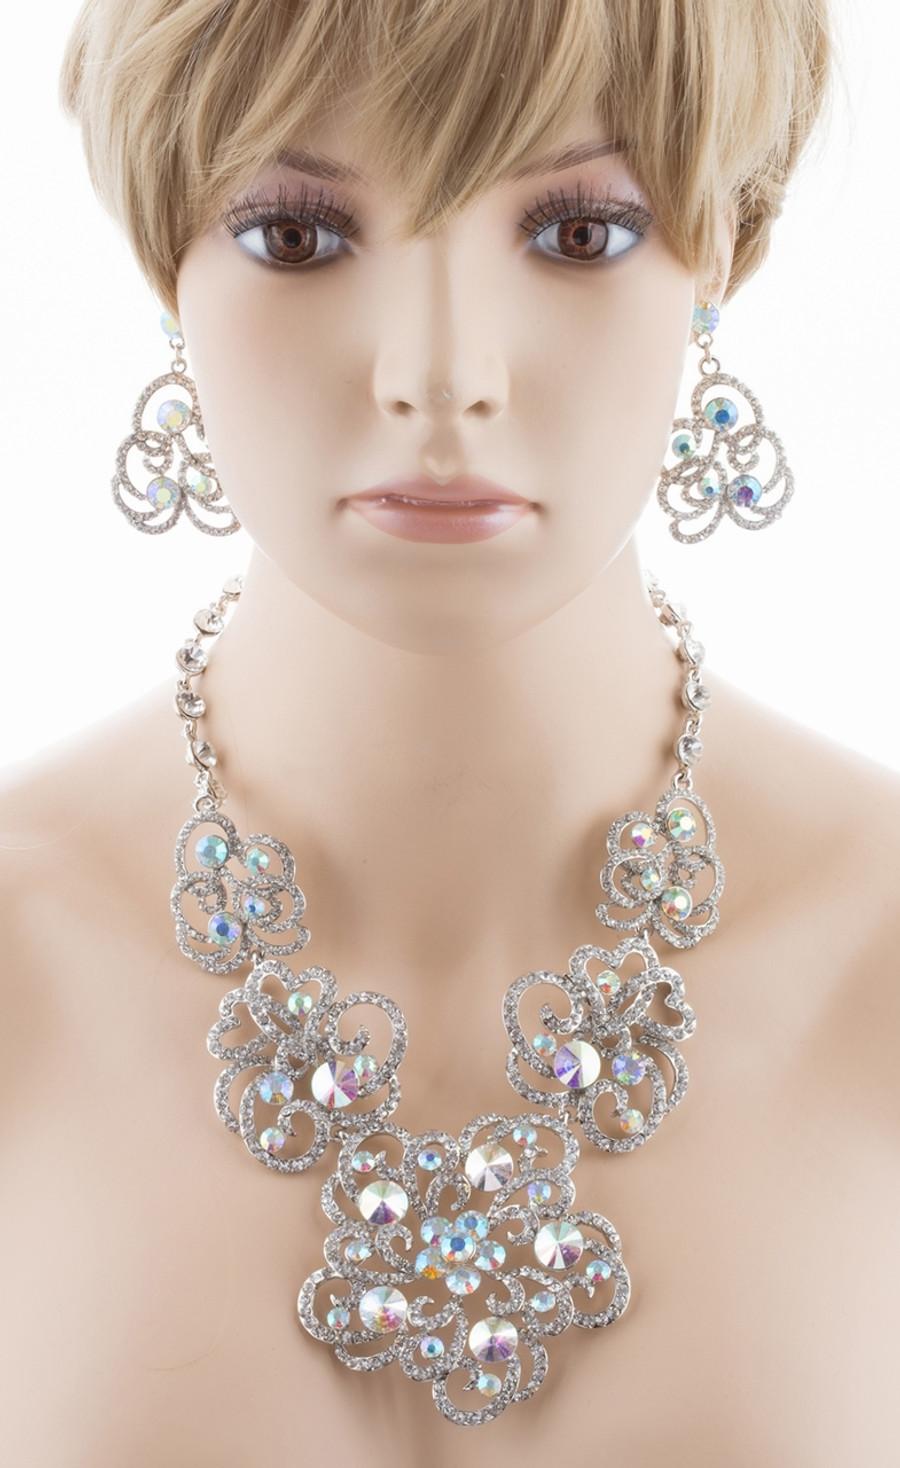 Bridal Wedding Jewelry Set Crystal Rhinestone Chunky Floral Necklace Silver AB